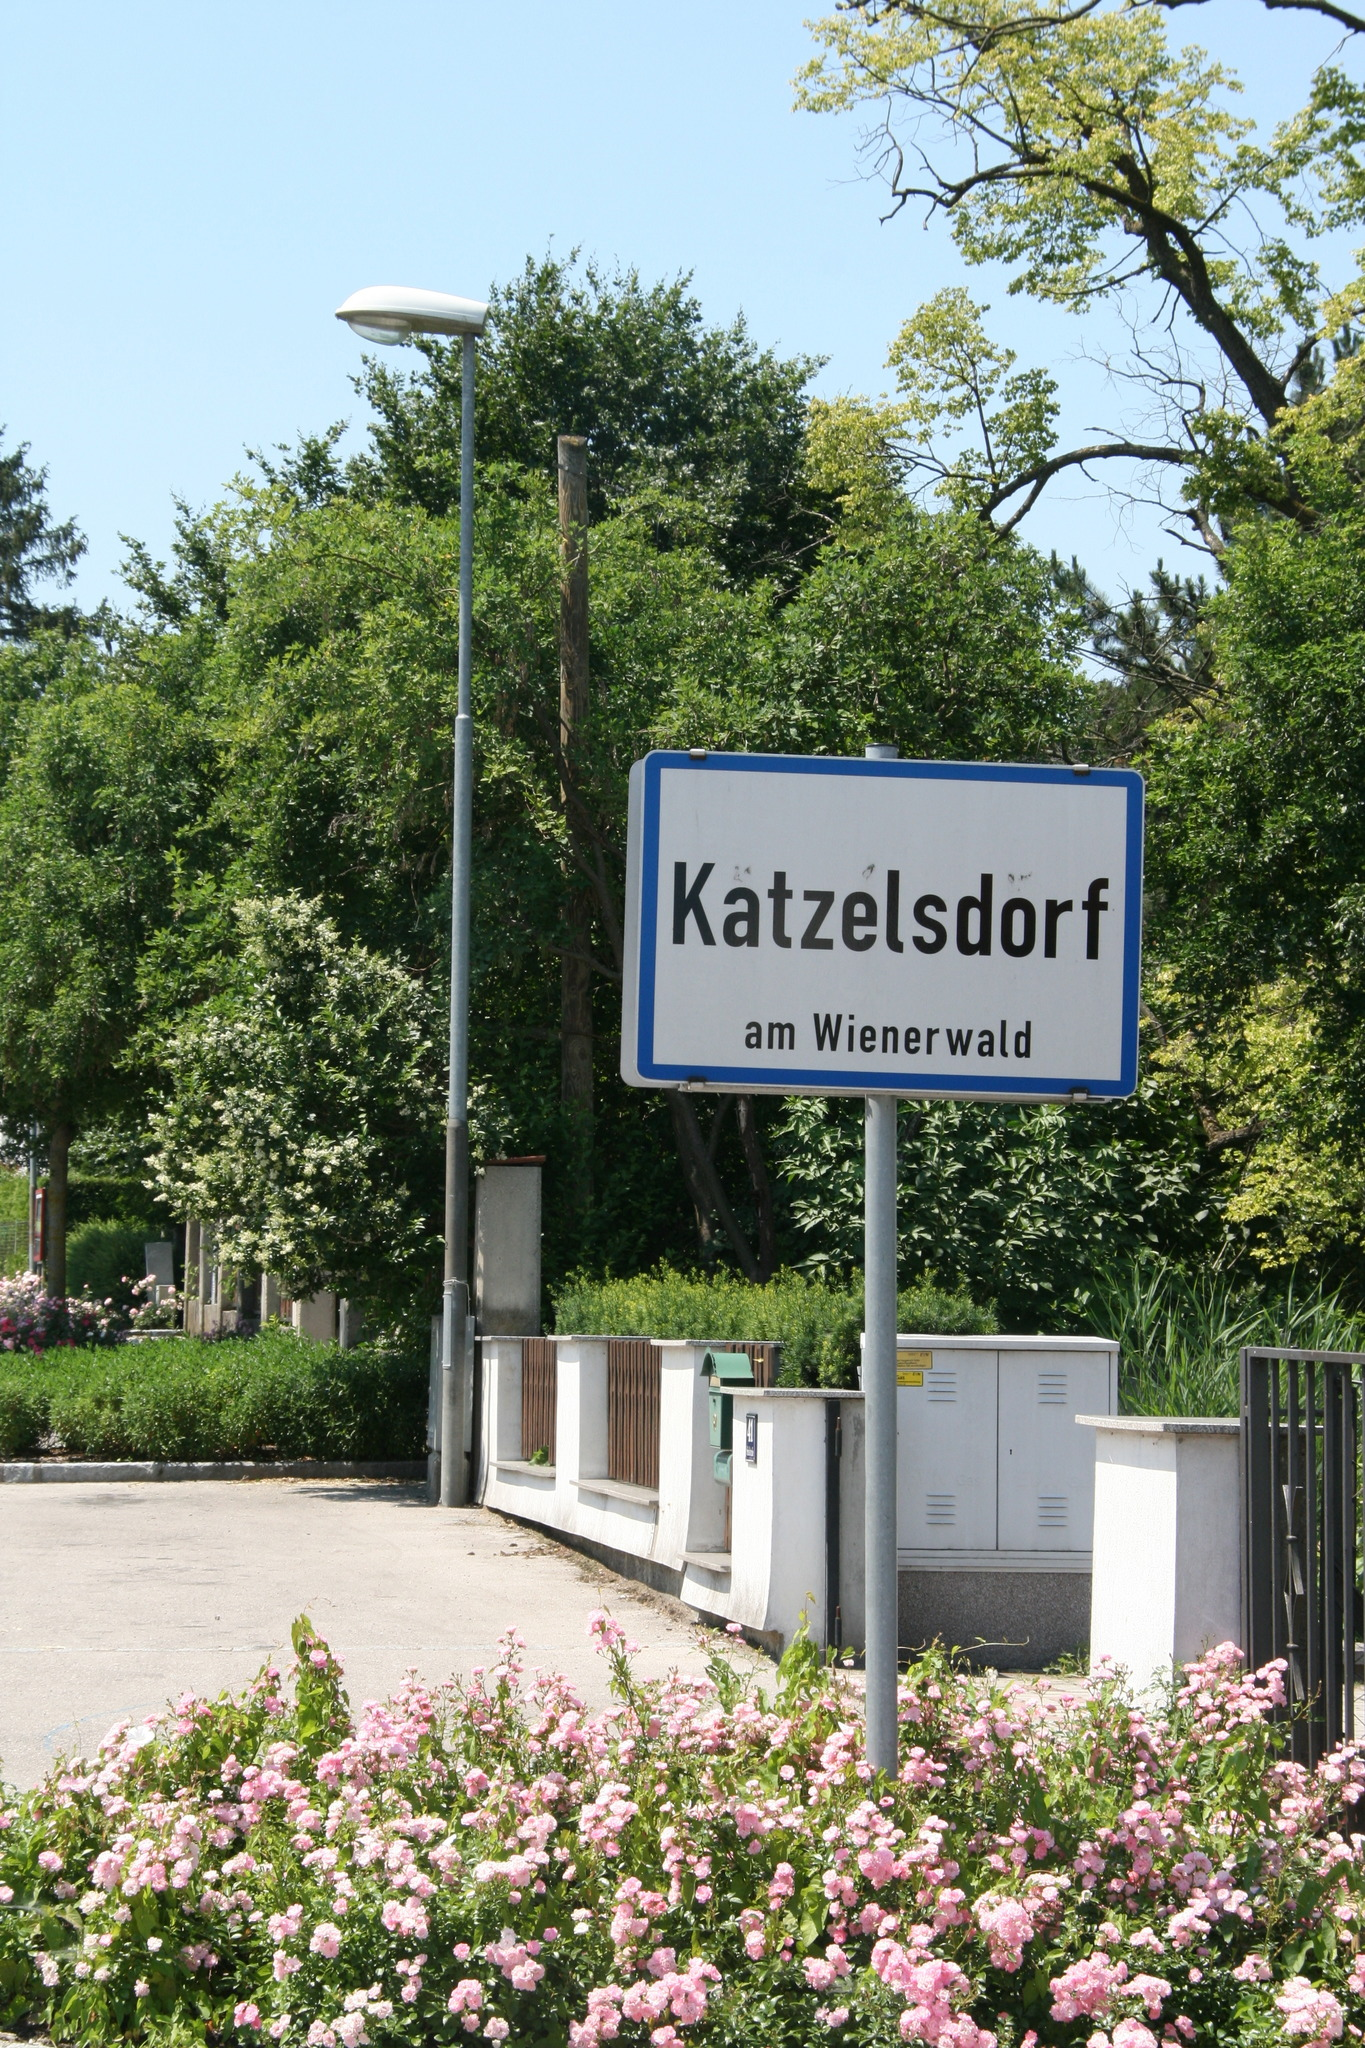 Kontaktanzeigen Katzelsdorf | Locanto Dating Katzelsdorf